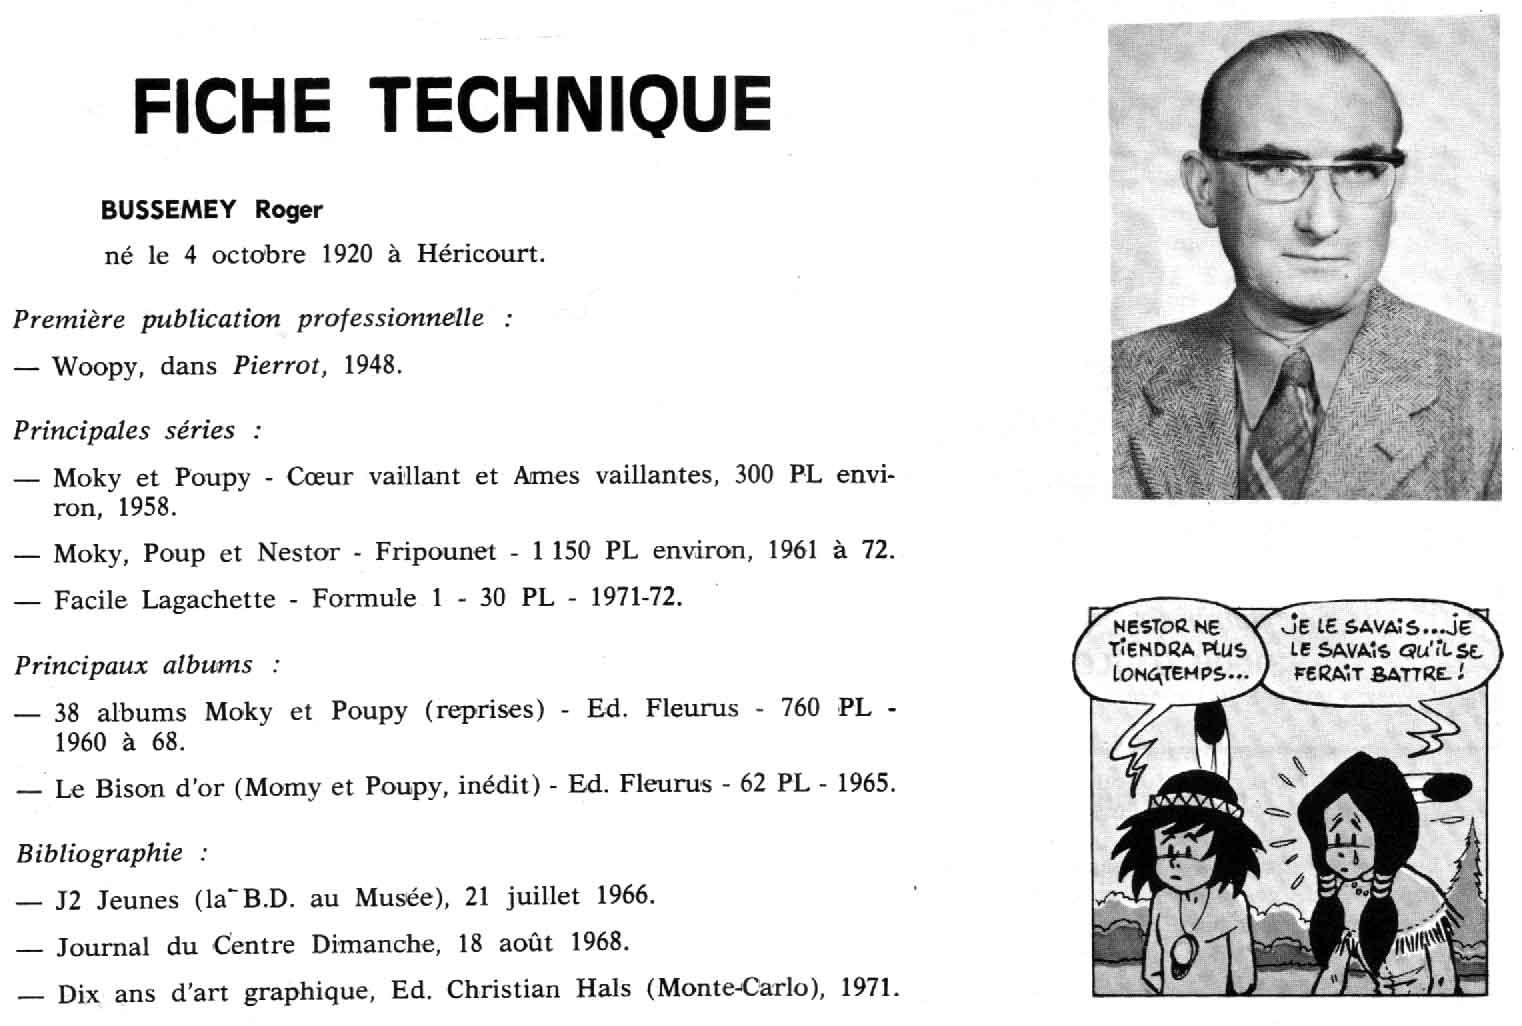 Photo dans Haga n° 4 (février 1973).